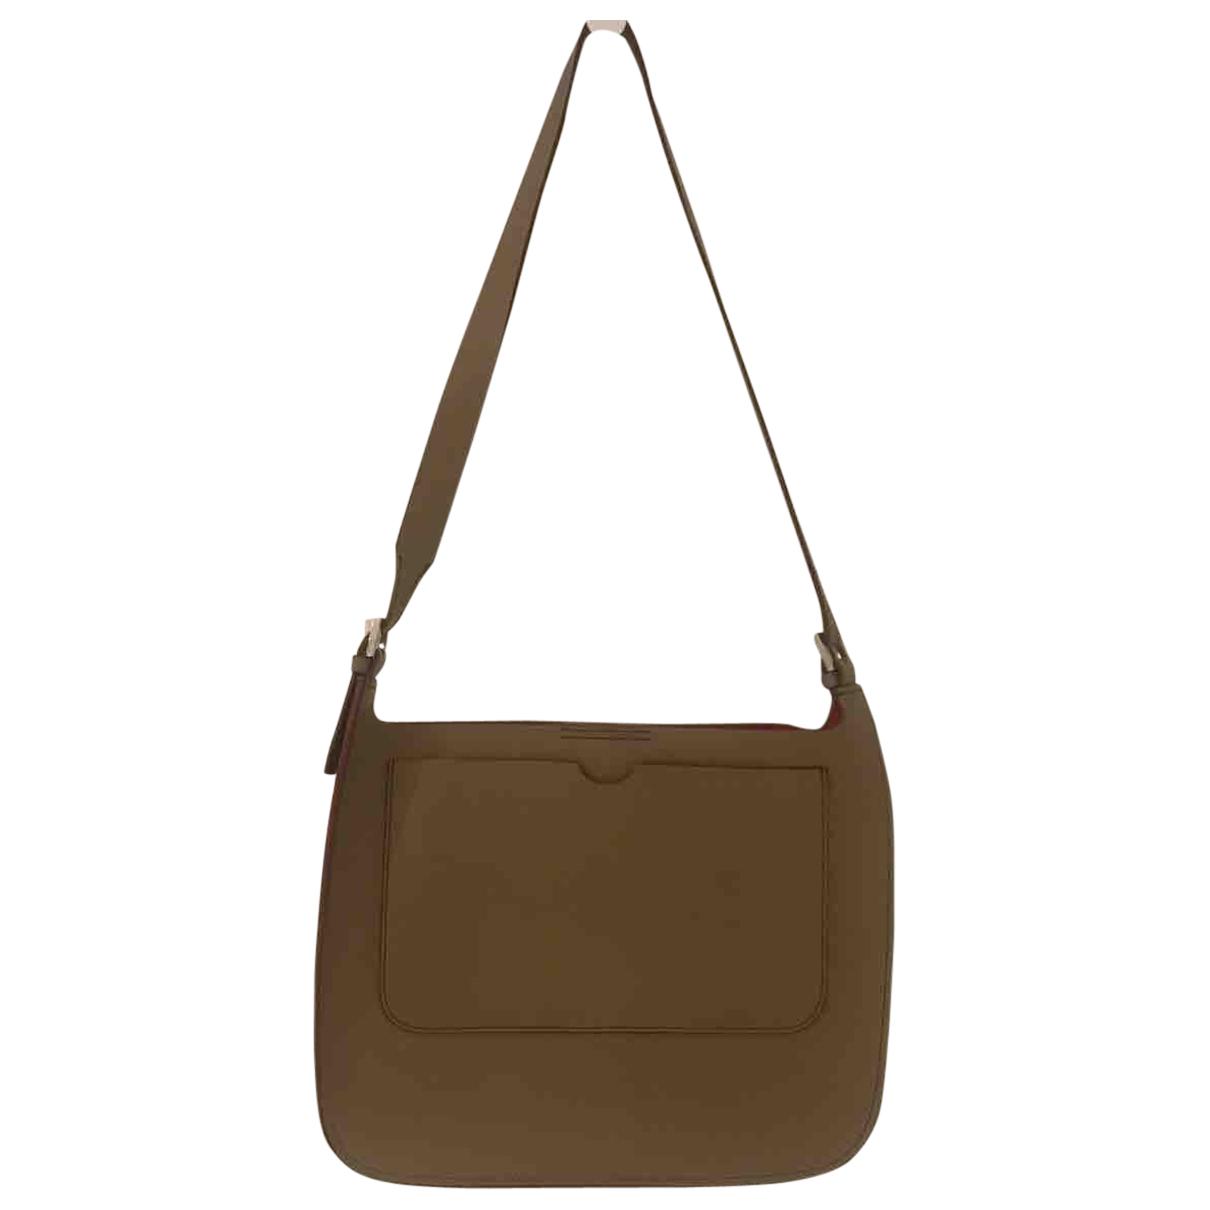 Bally N Beige Suede handbag for Women N